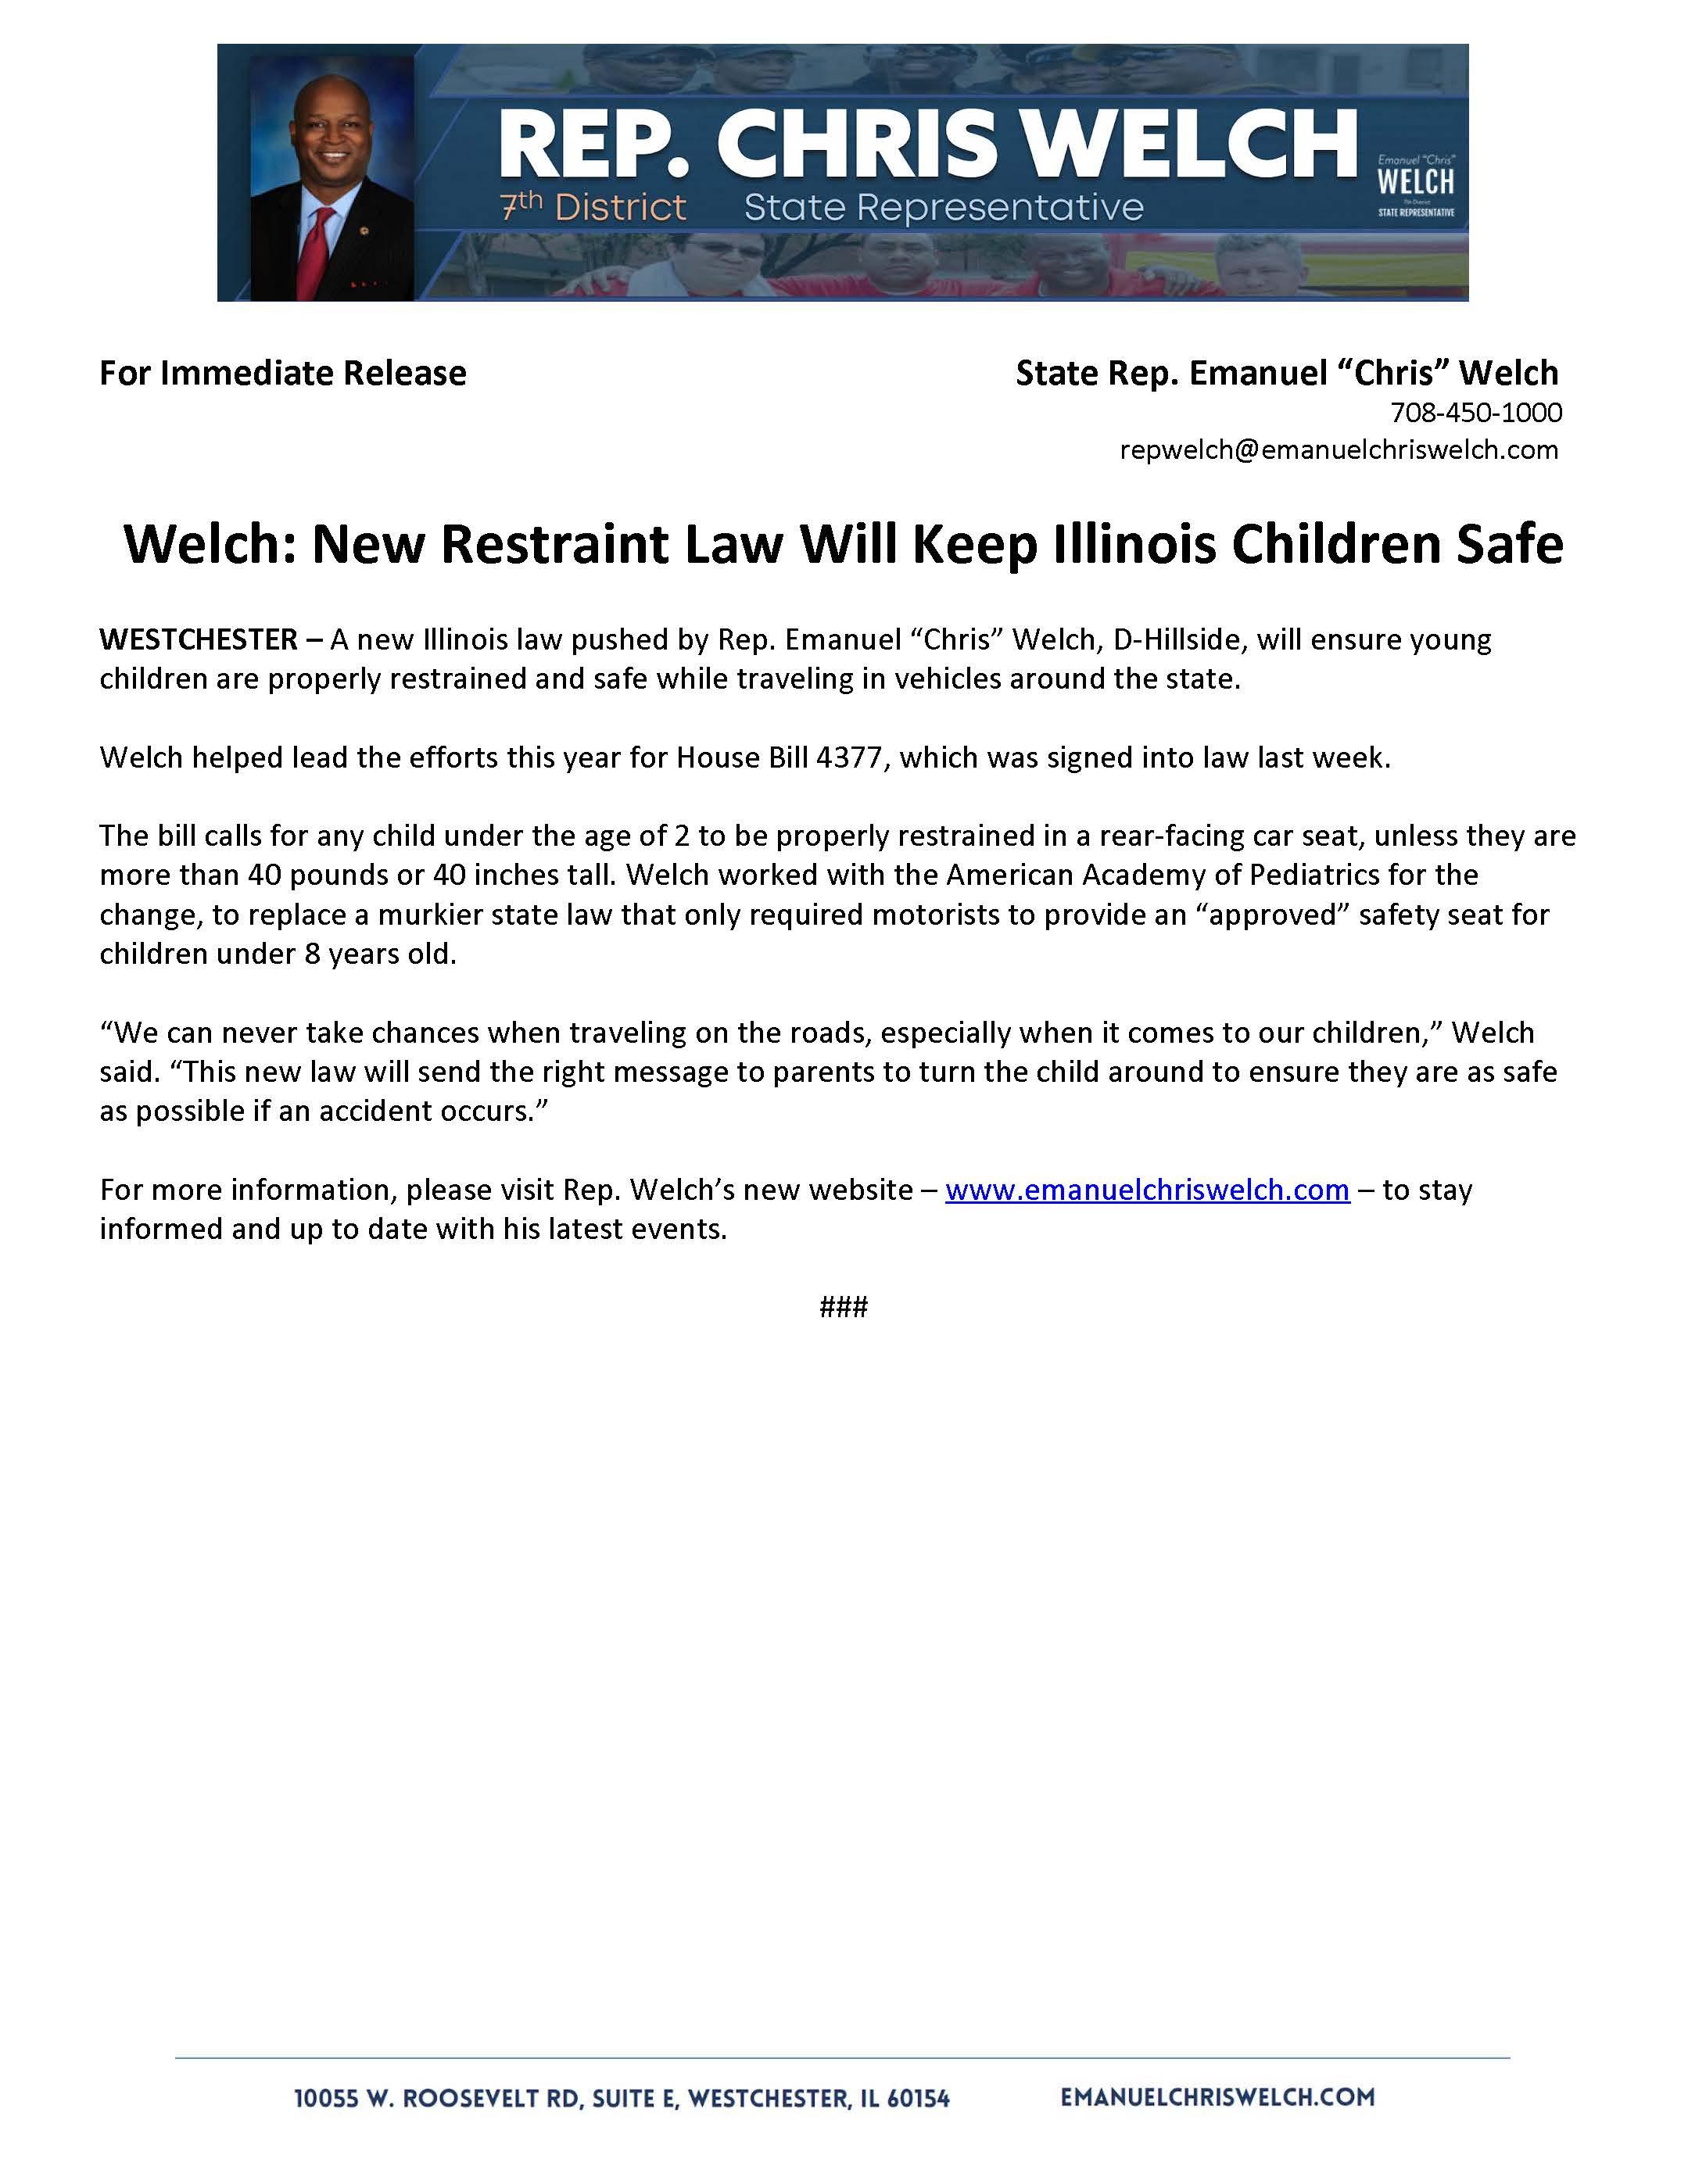 Welch: New Restraint Law Will Keep Illinois Children Safe  (August 10, 2018)